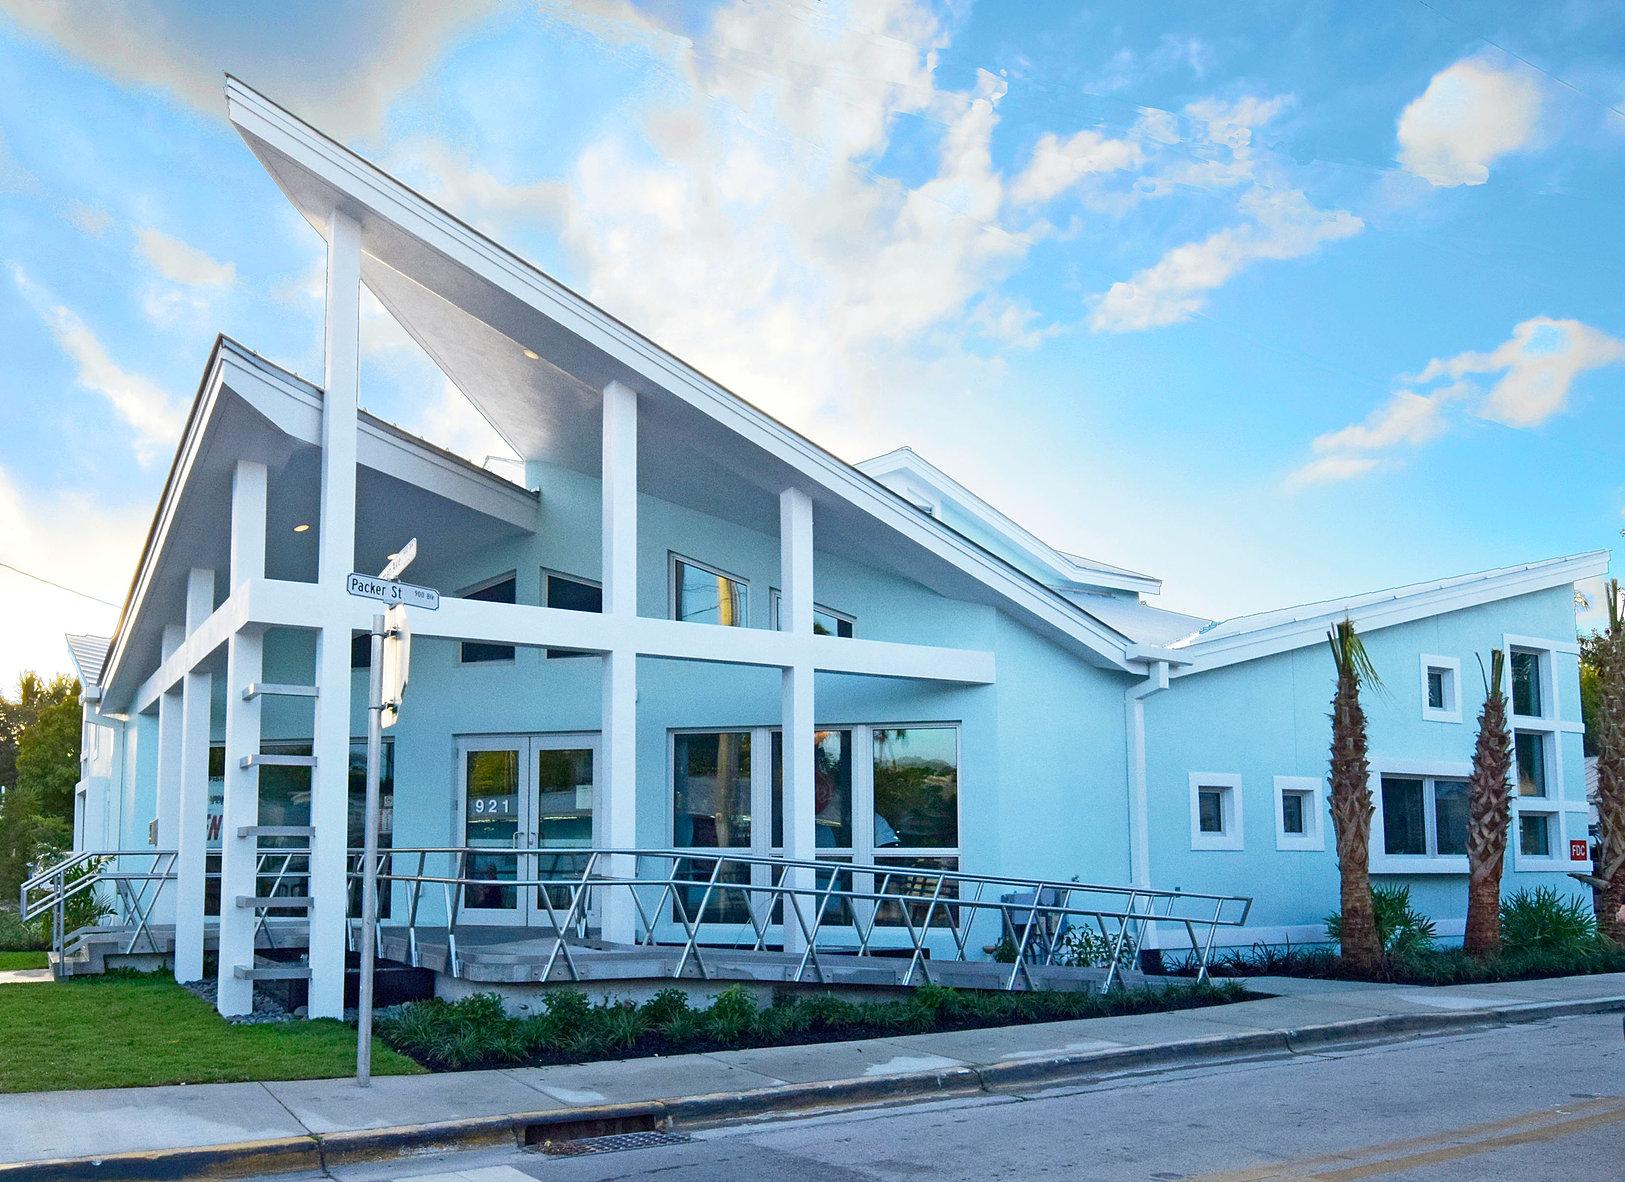 Seven fish restaurant in key west florida for Seven fish key west fl